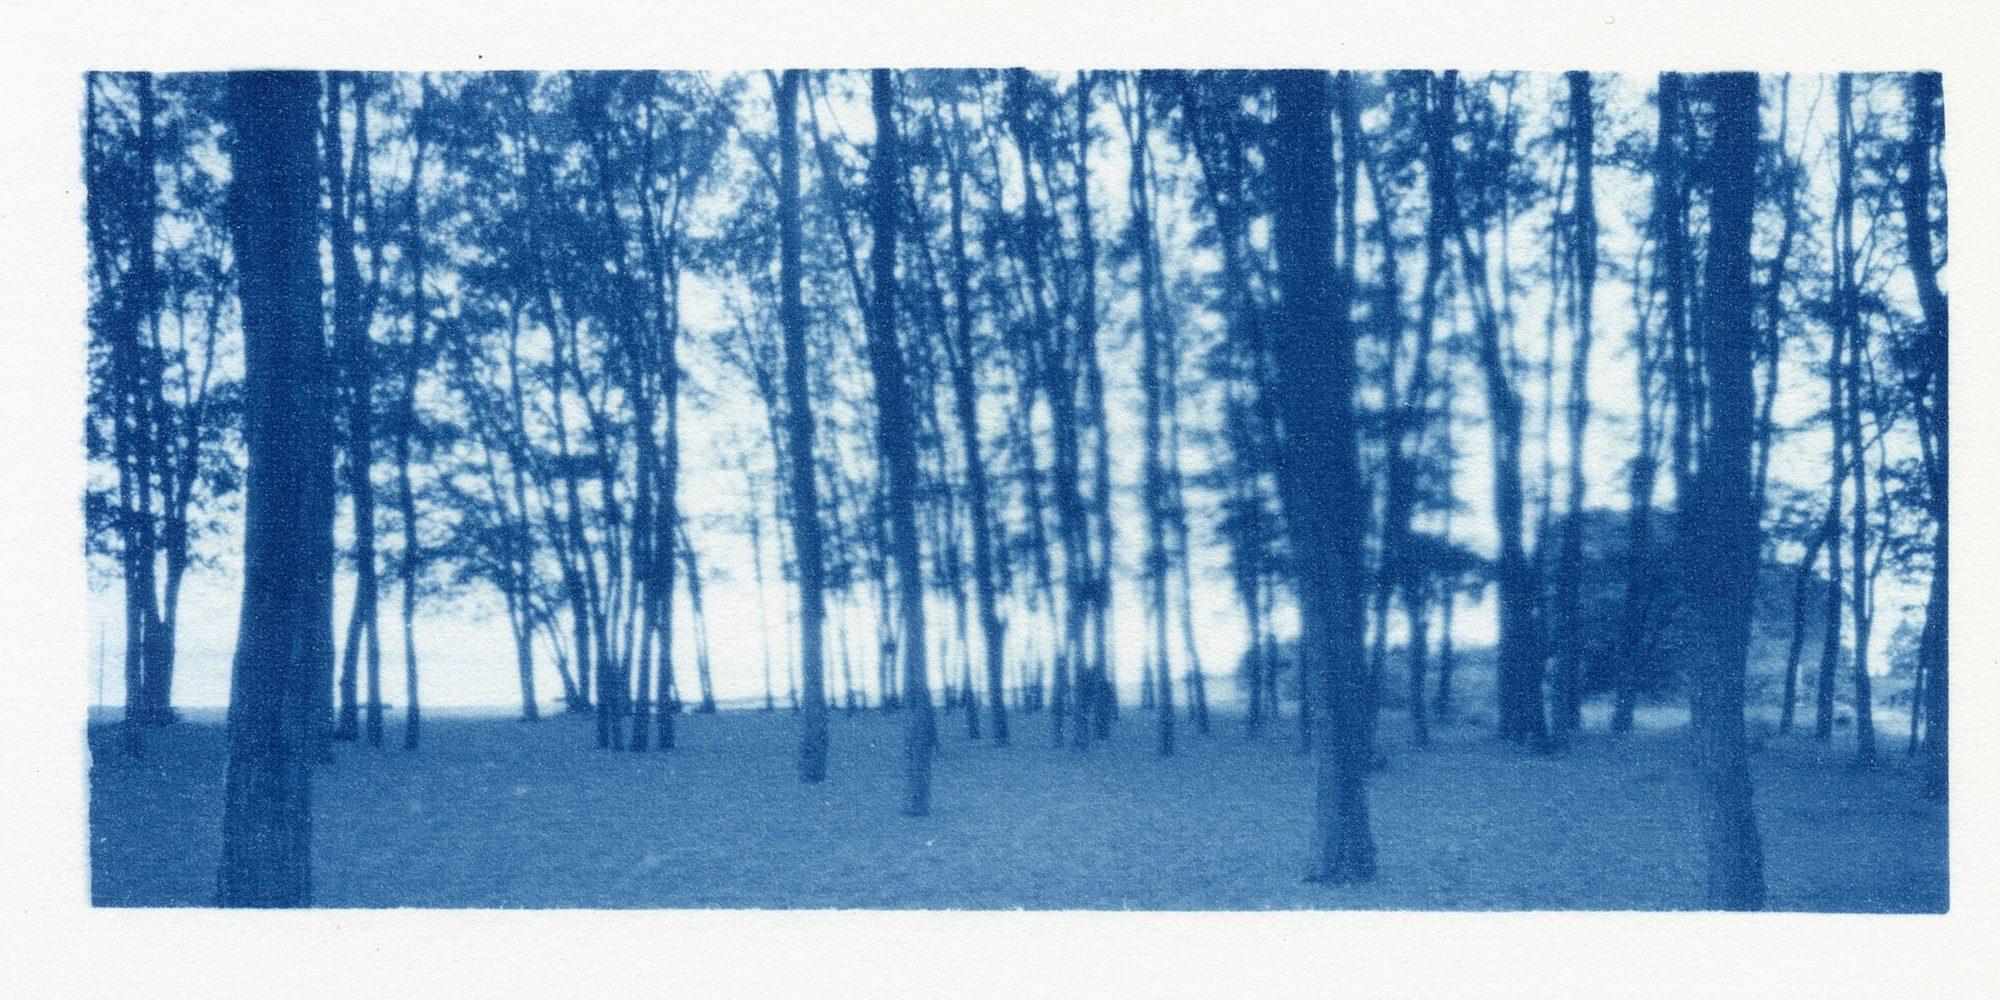 cyanotype from orthos plus negative